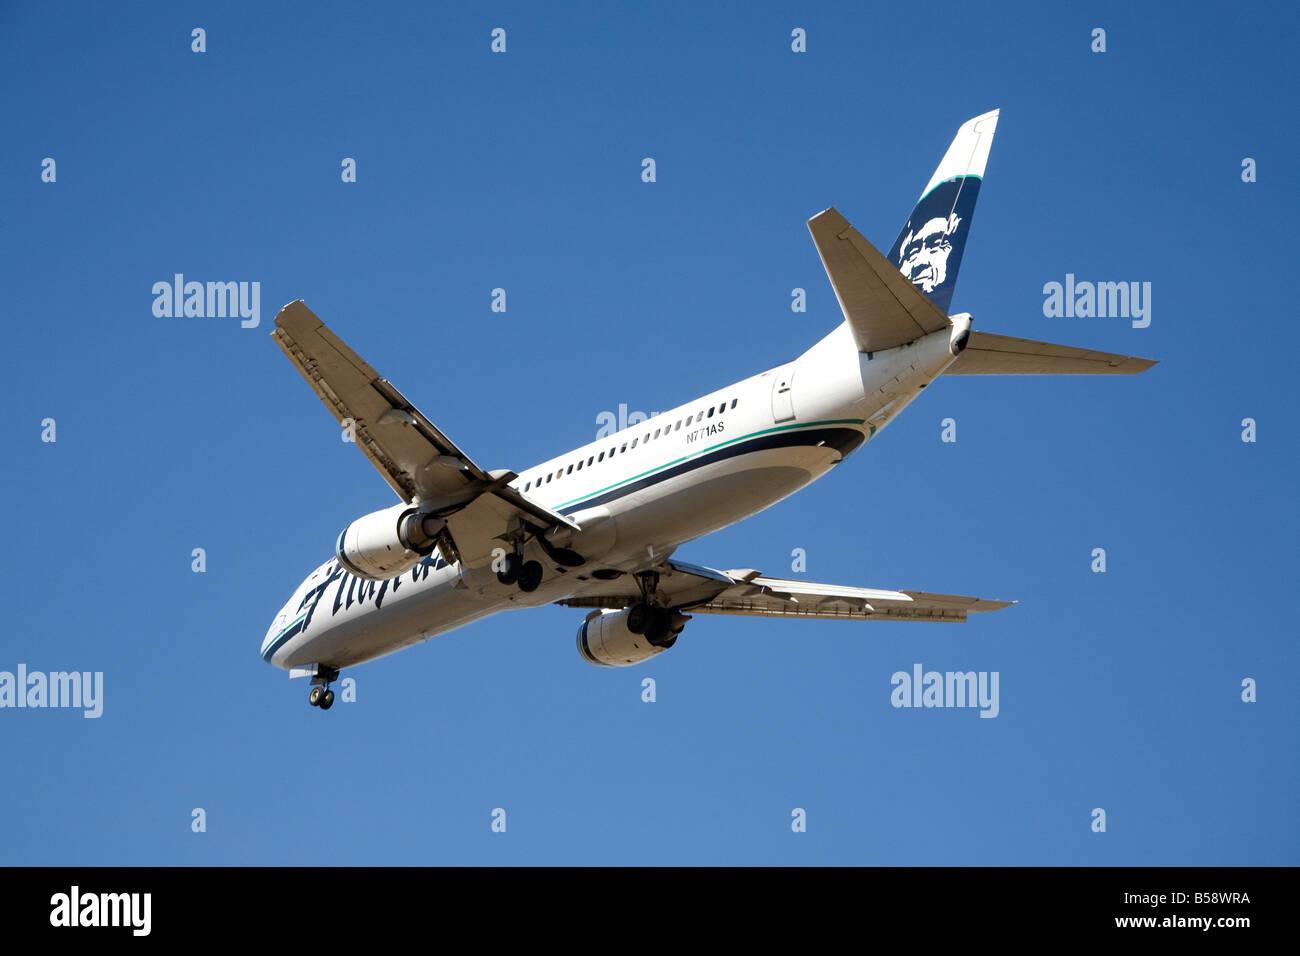 Alaska Airlines Boeing 737 400 approaching San Jose International Airport - Stock Image